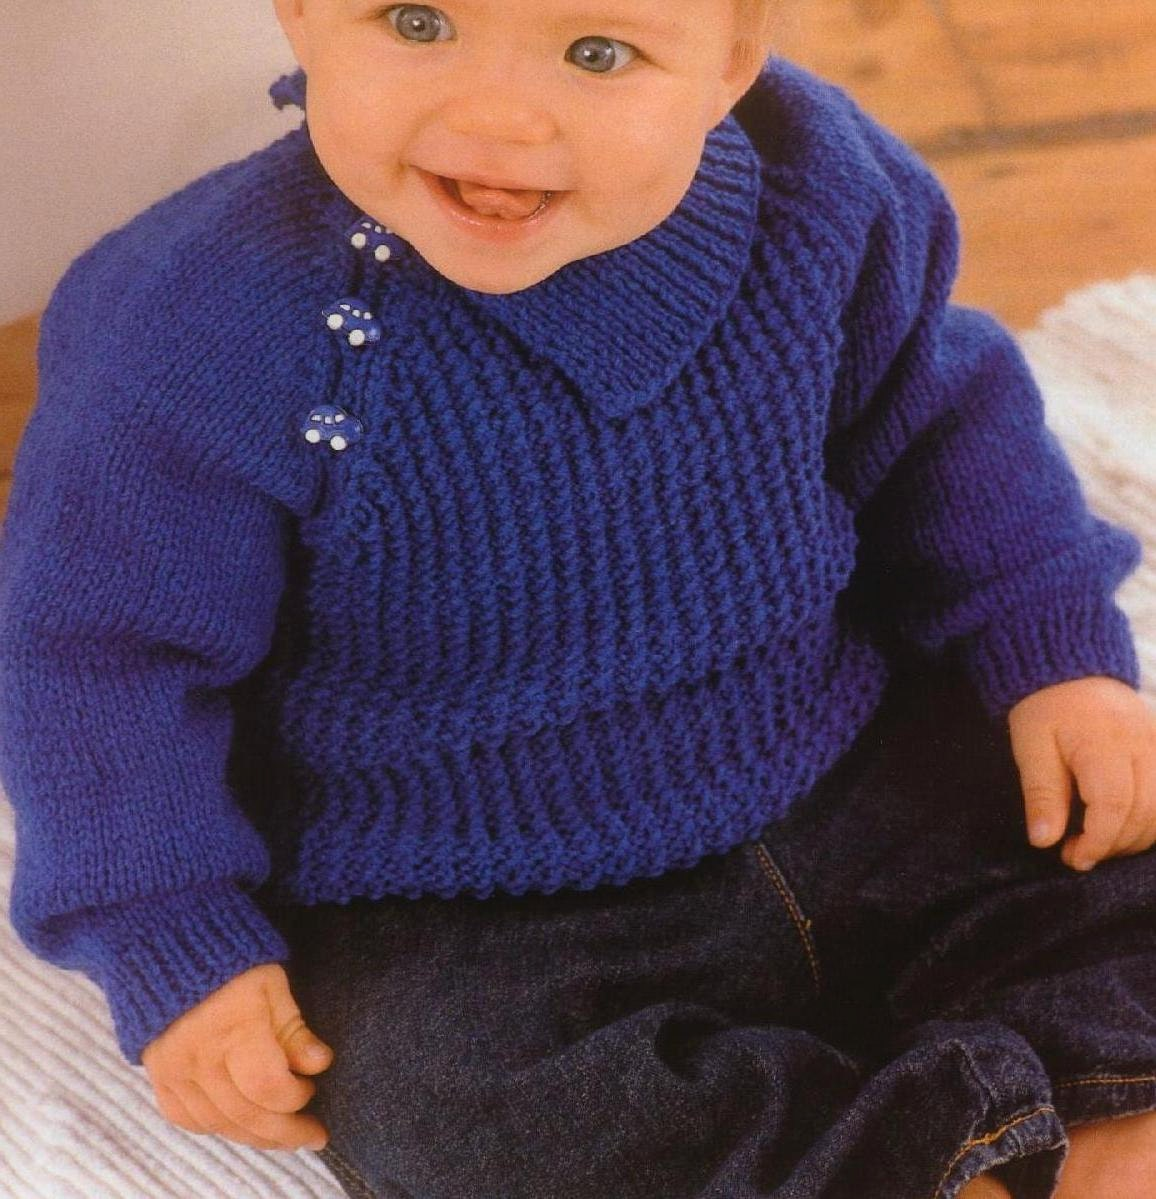 c3f59643315a Vintage Knitting Pattern PDF to make Baby Toddler A Plain or Stripe ...